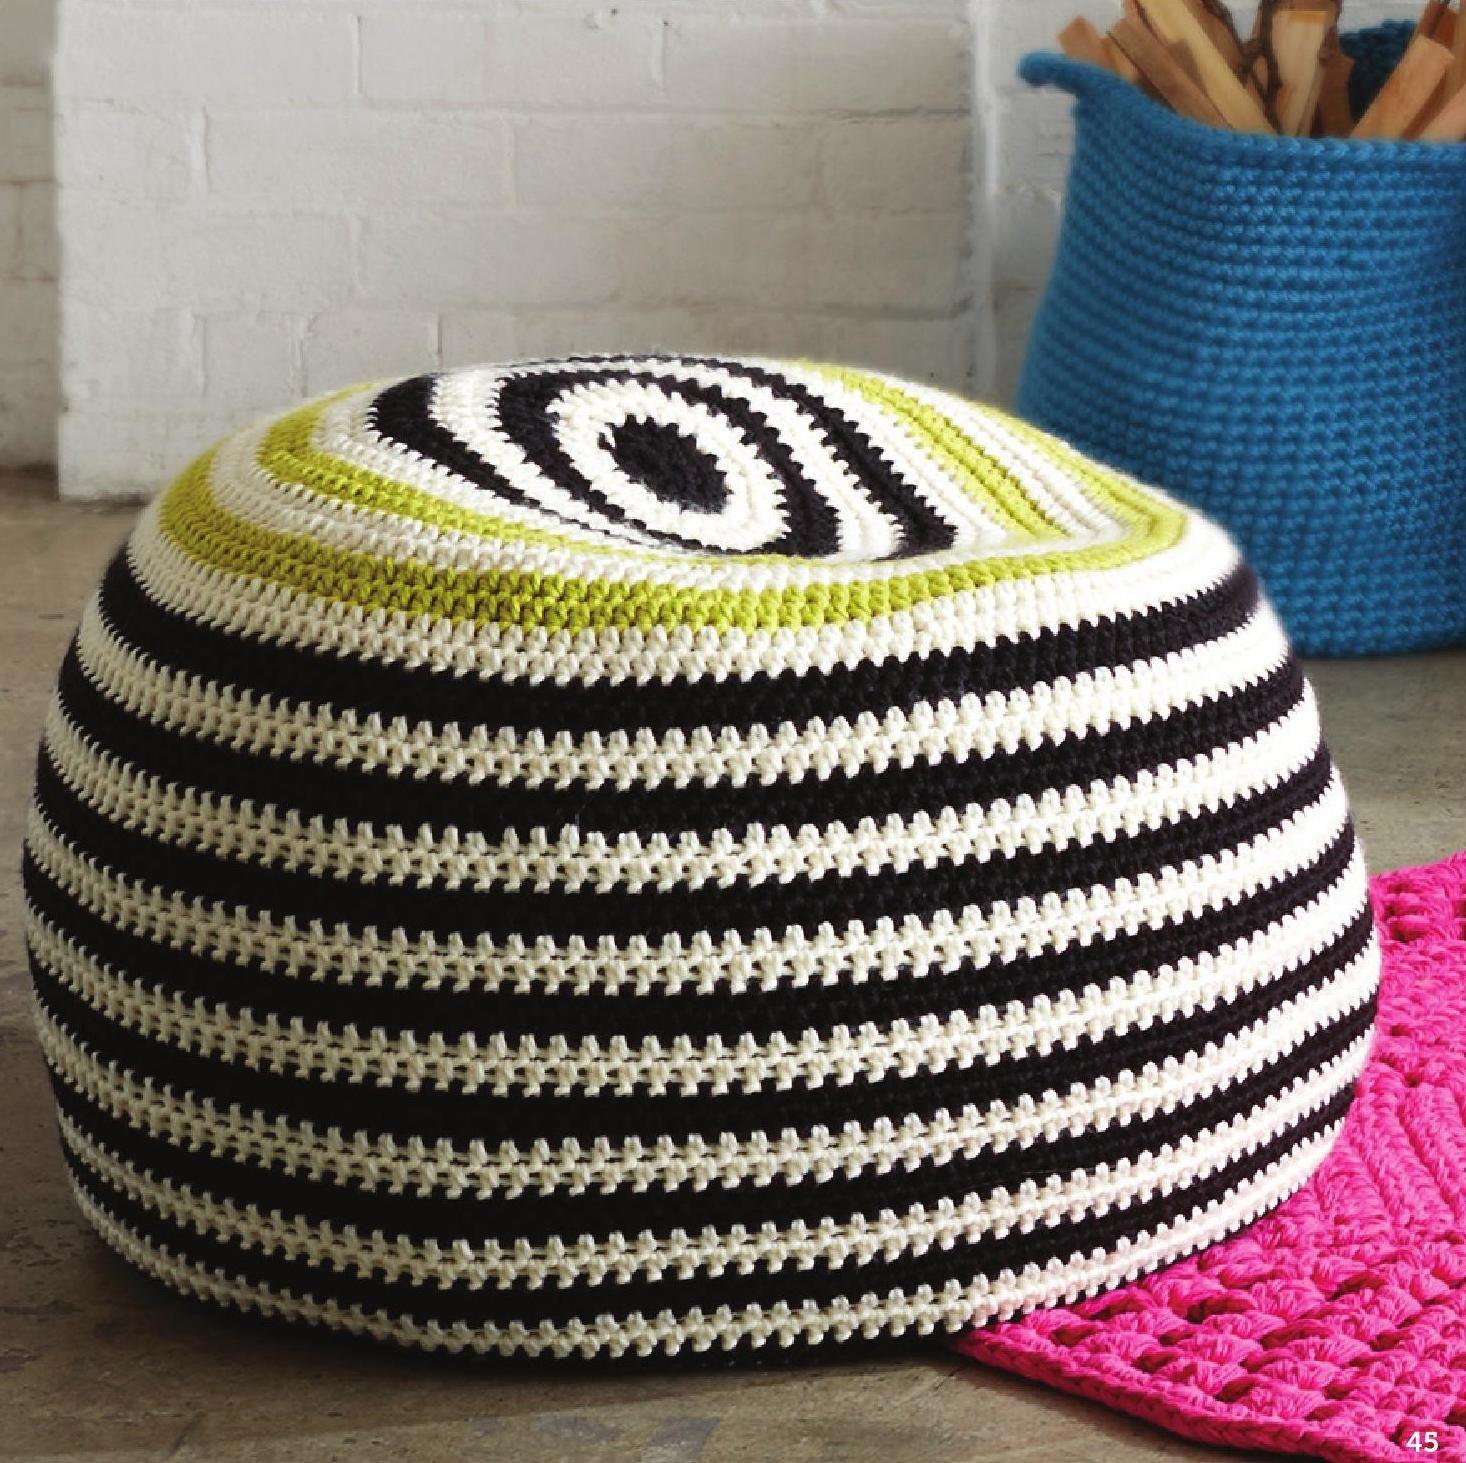 diy graphic stripes pouf crochet h keln crochet pinterest stricken h keln h keln und. Black Bedroom Furniture Sets. Home Design Ideas